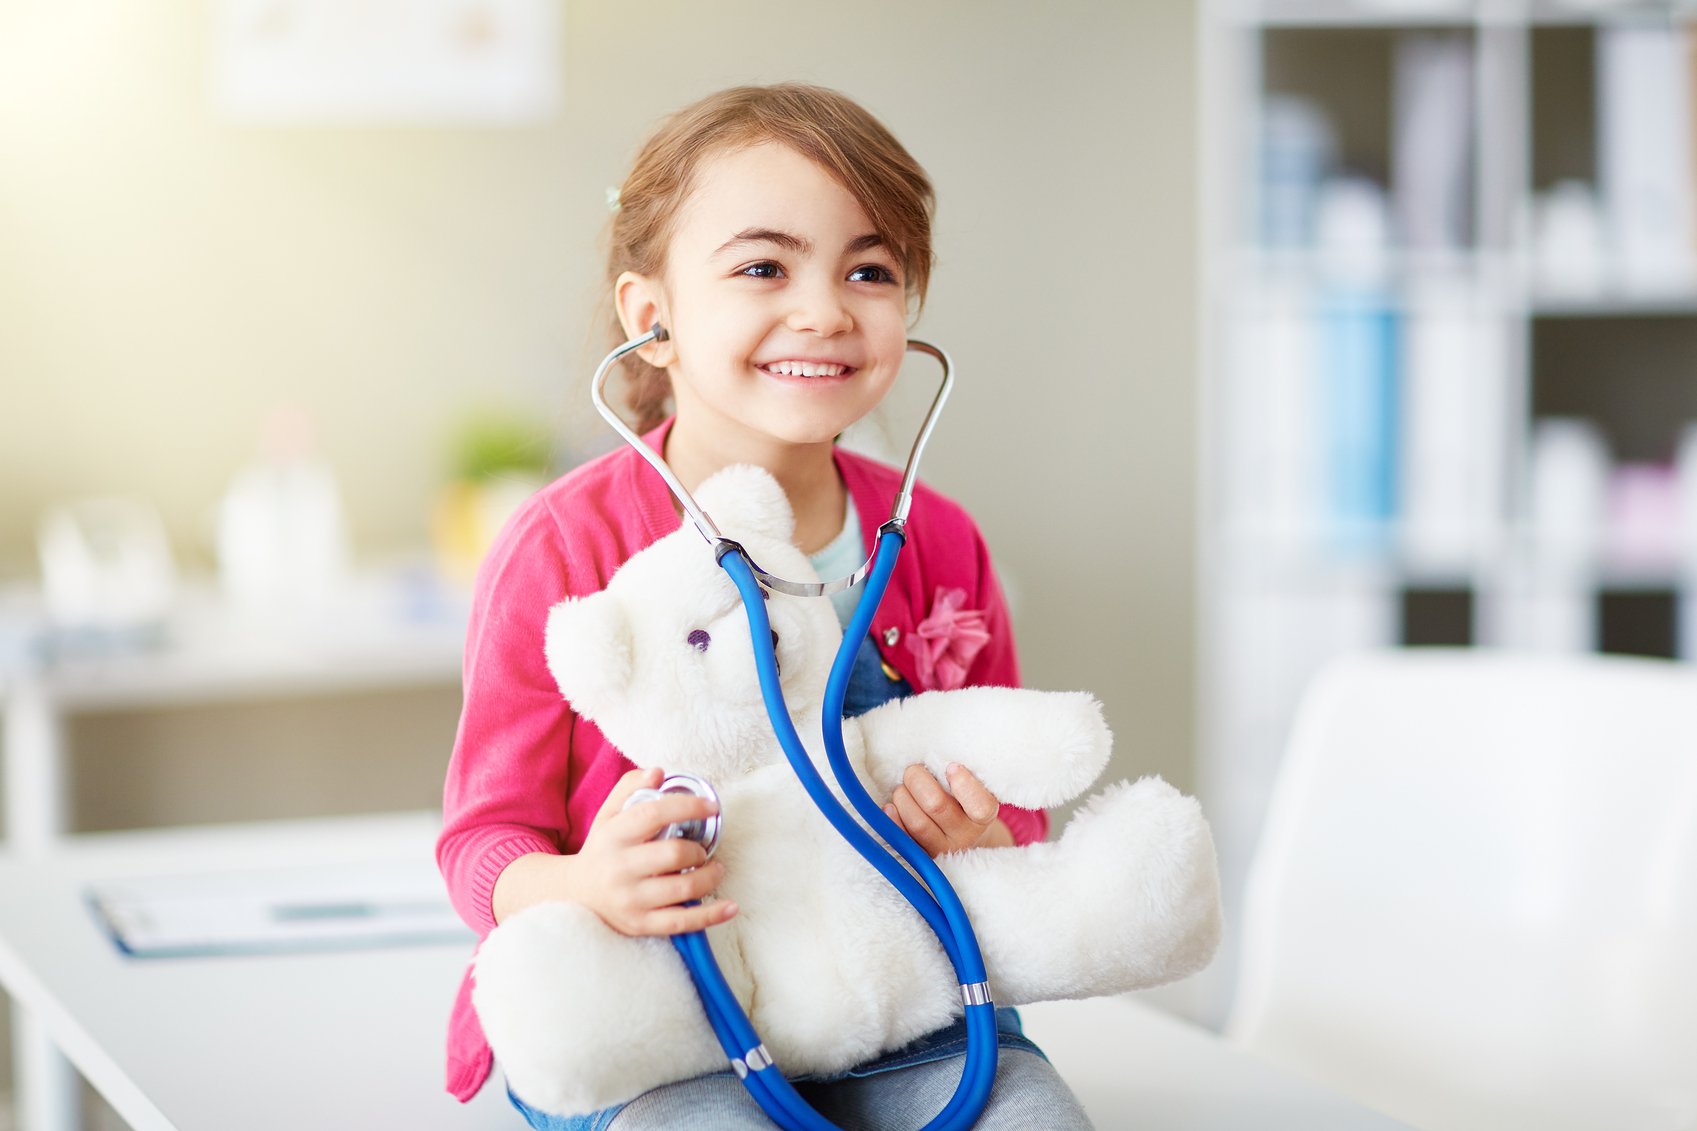 How Pediatric study will help the Clinical Medicine program?